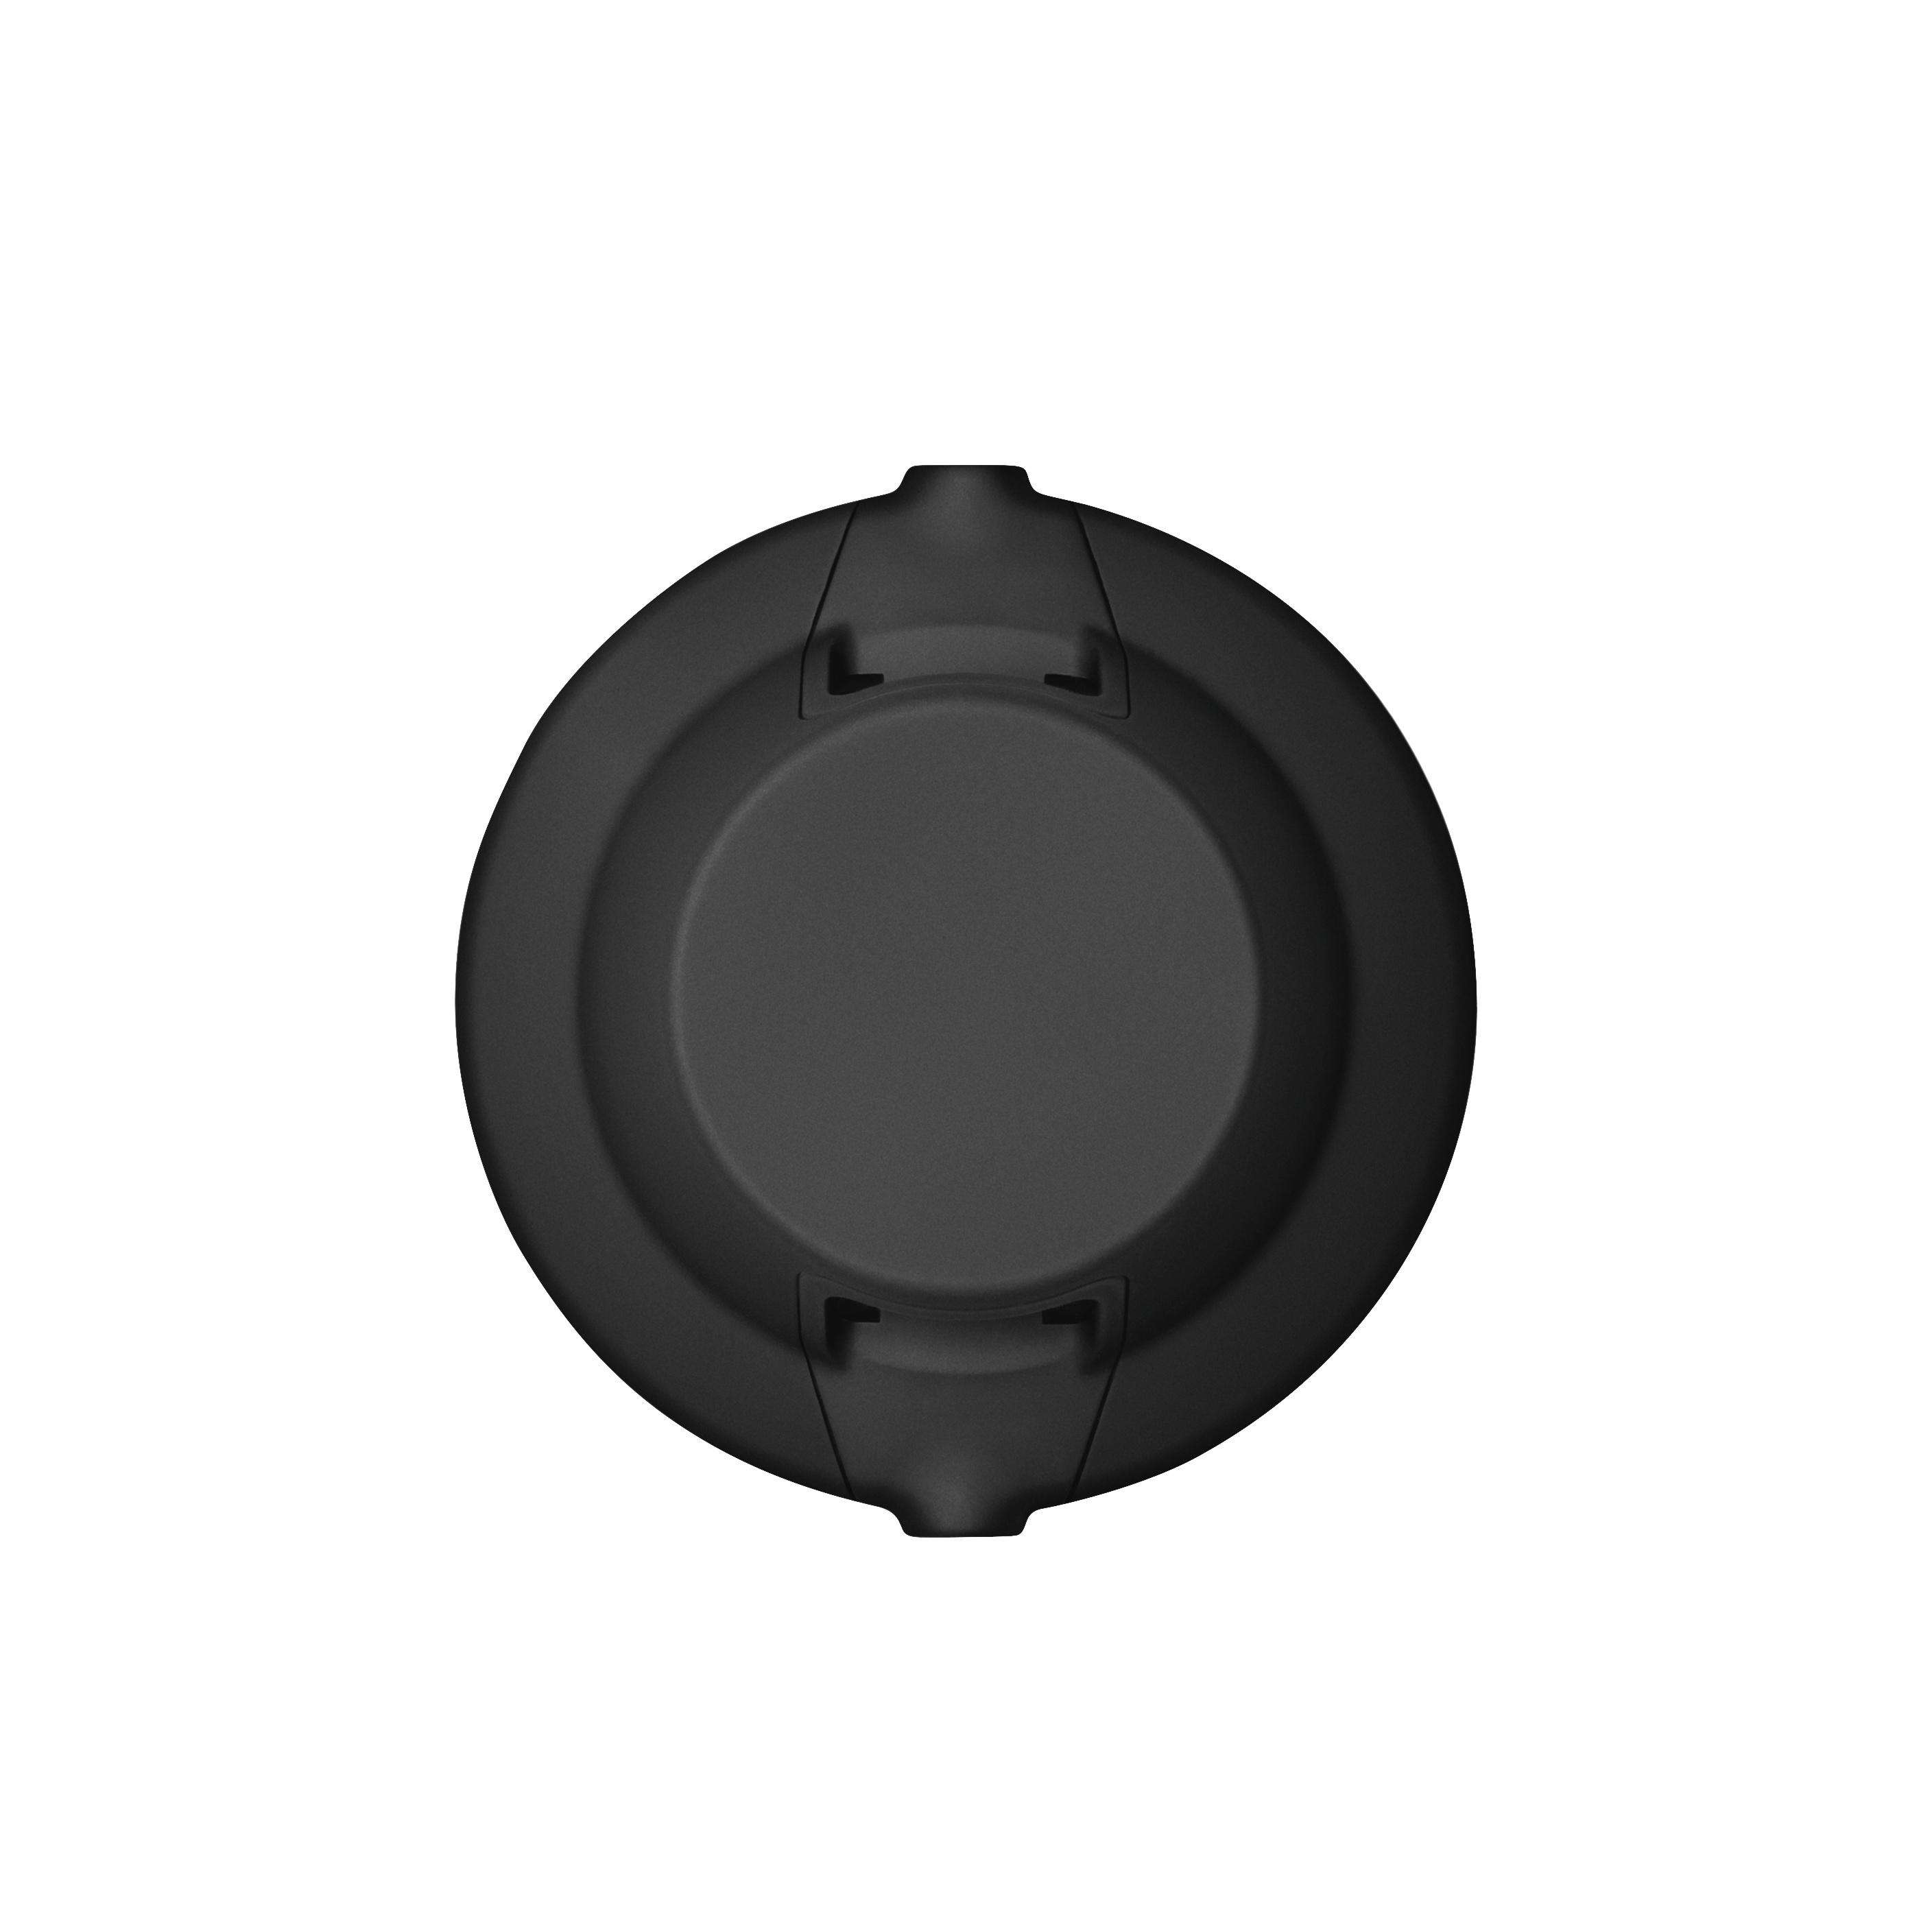 Aiaiai Speaker Units S01 - All Round Speaker 235504